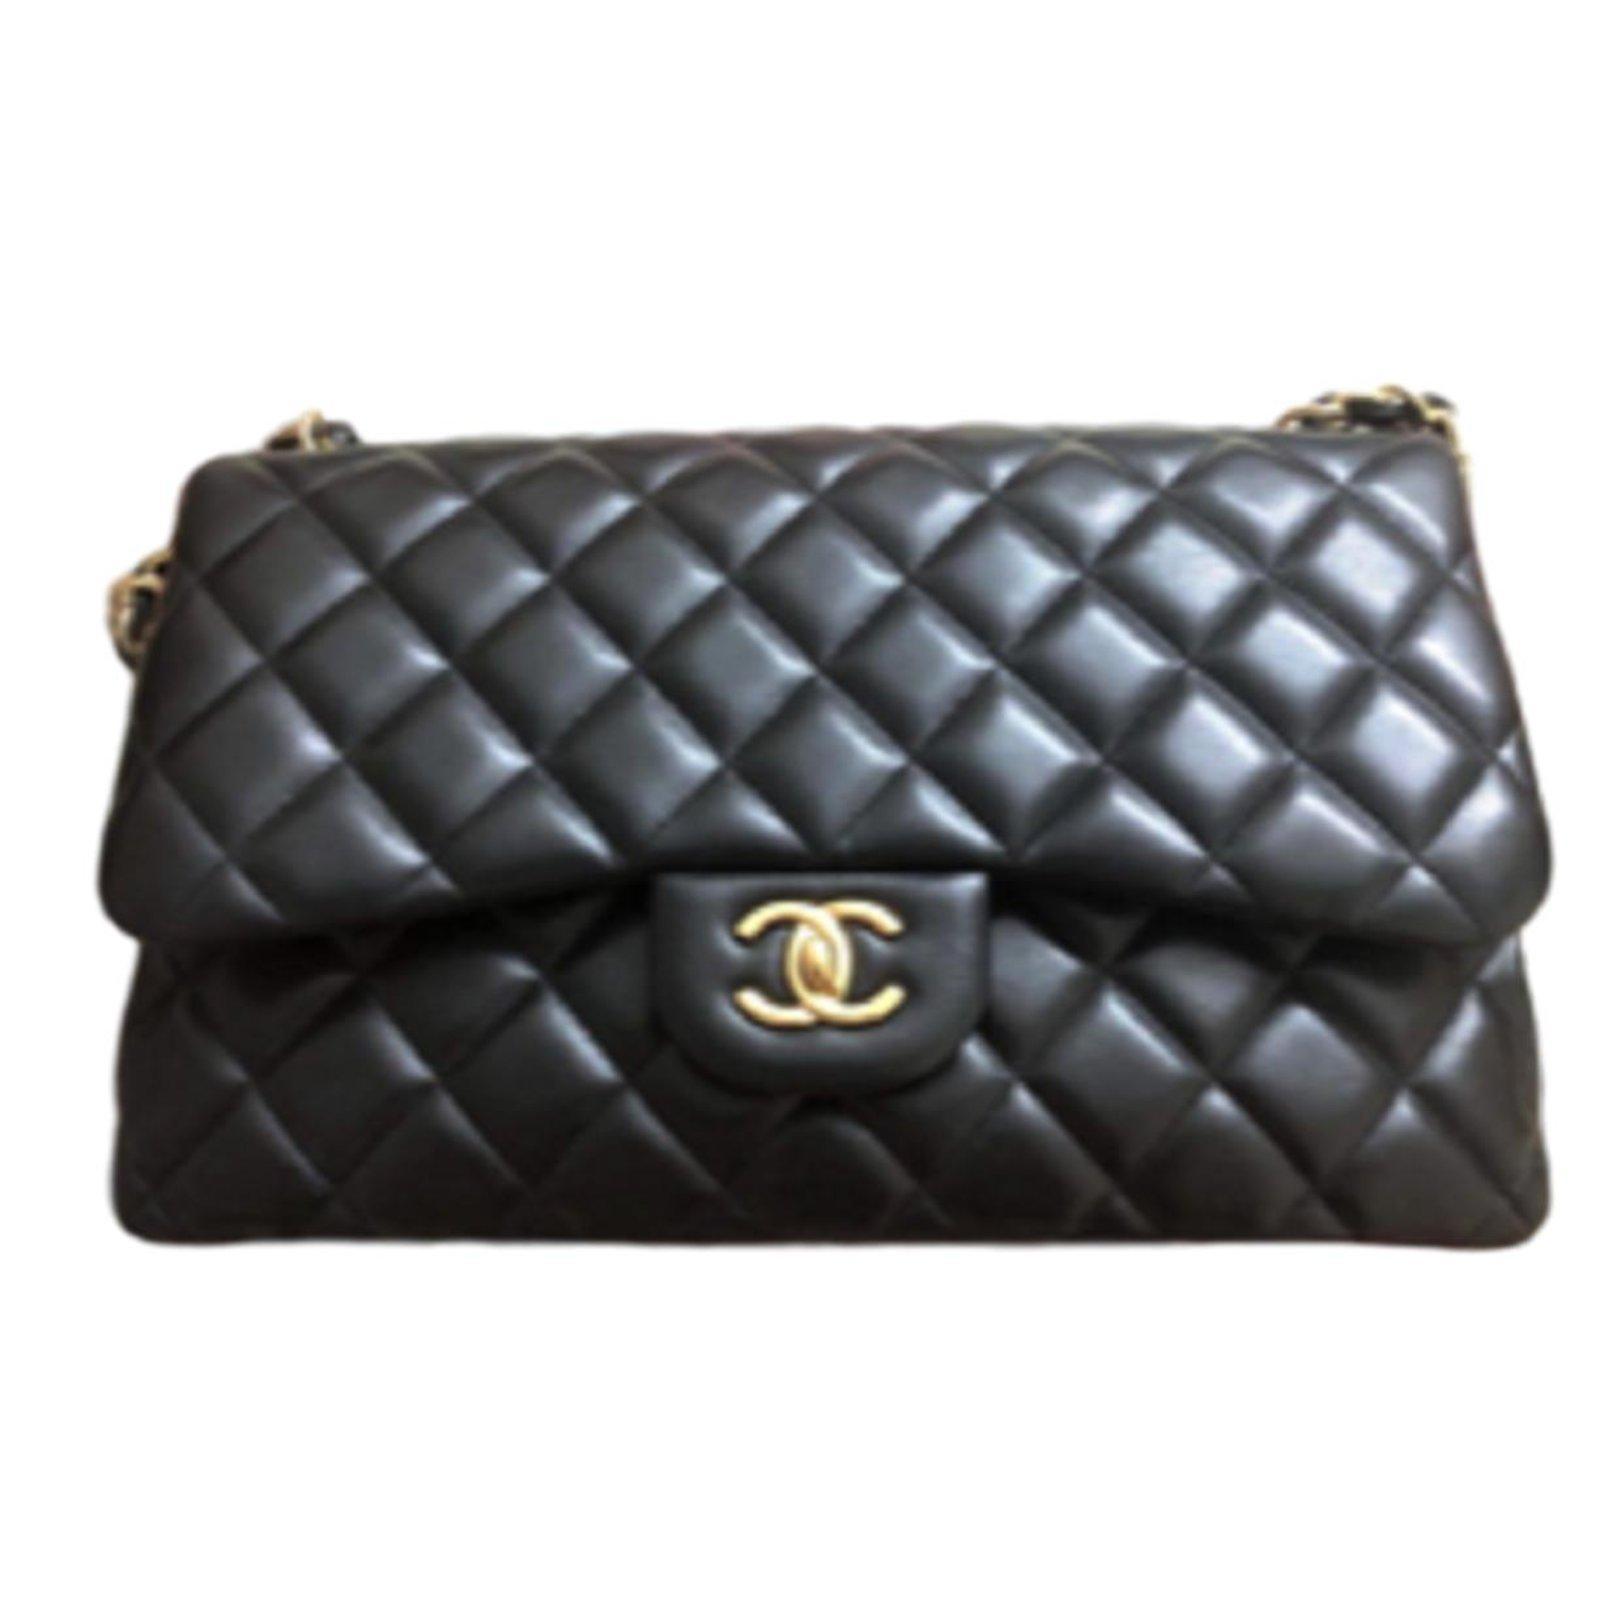 4fd0deacd4b0 Chanel Chanel Classic Black lambskin Jumbo Flag bag Handbags Lambskin Black  ref.83500